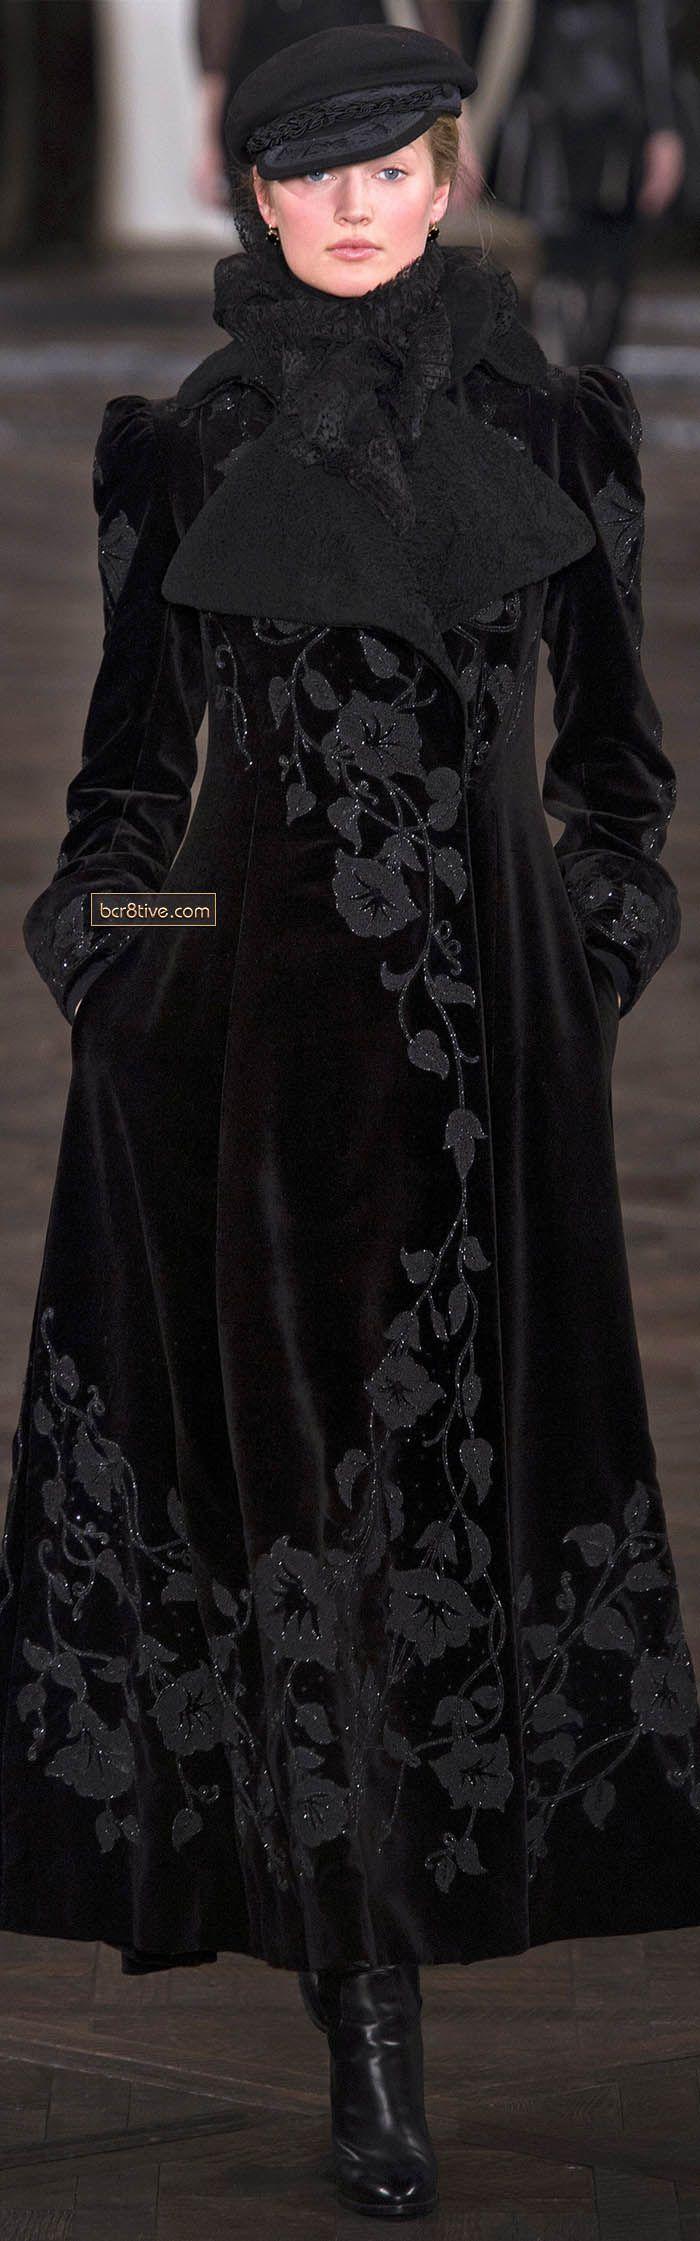 Black:  #Black ensemble ~ Ralph Lauren Fall Winter 2013 New York Fashion Week.